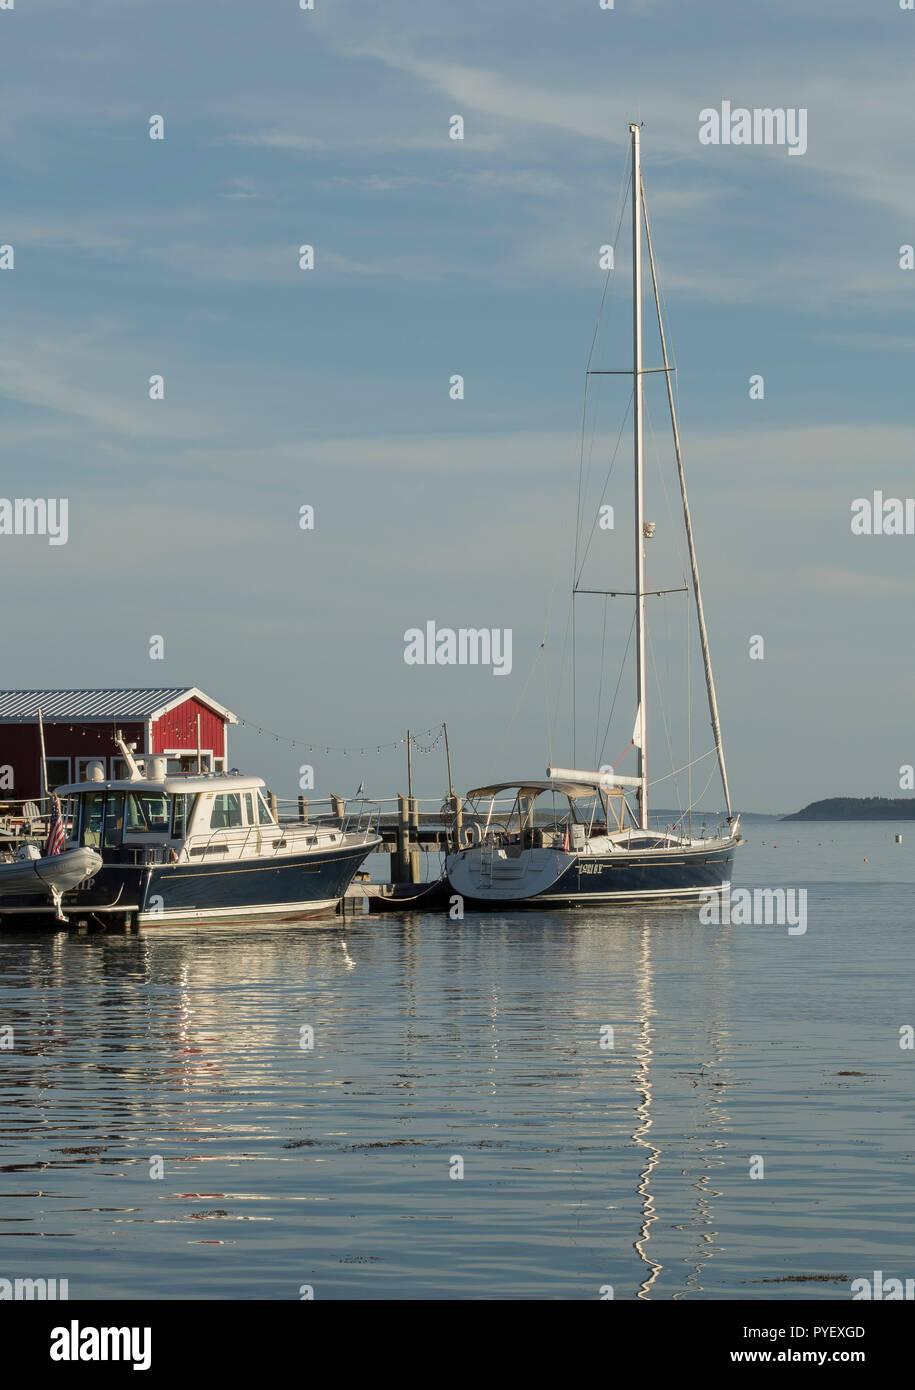 Fishing Boats, Tenants Harbor, Port Clyde, Maine - Stock Image